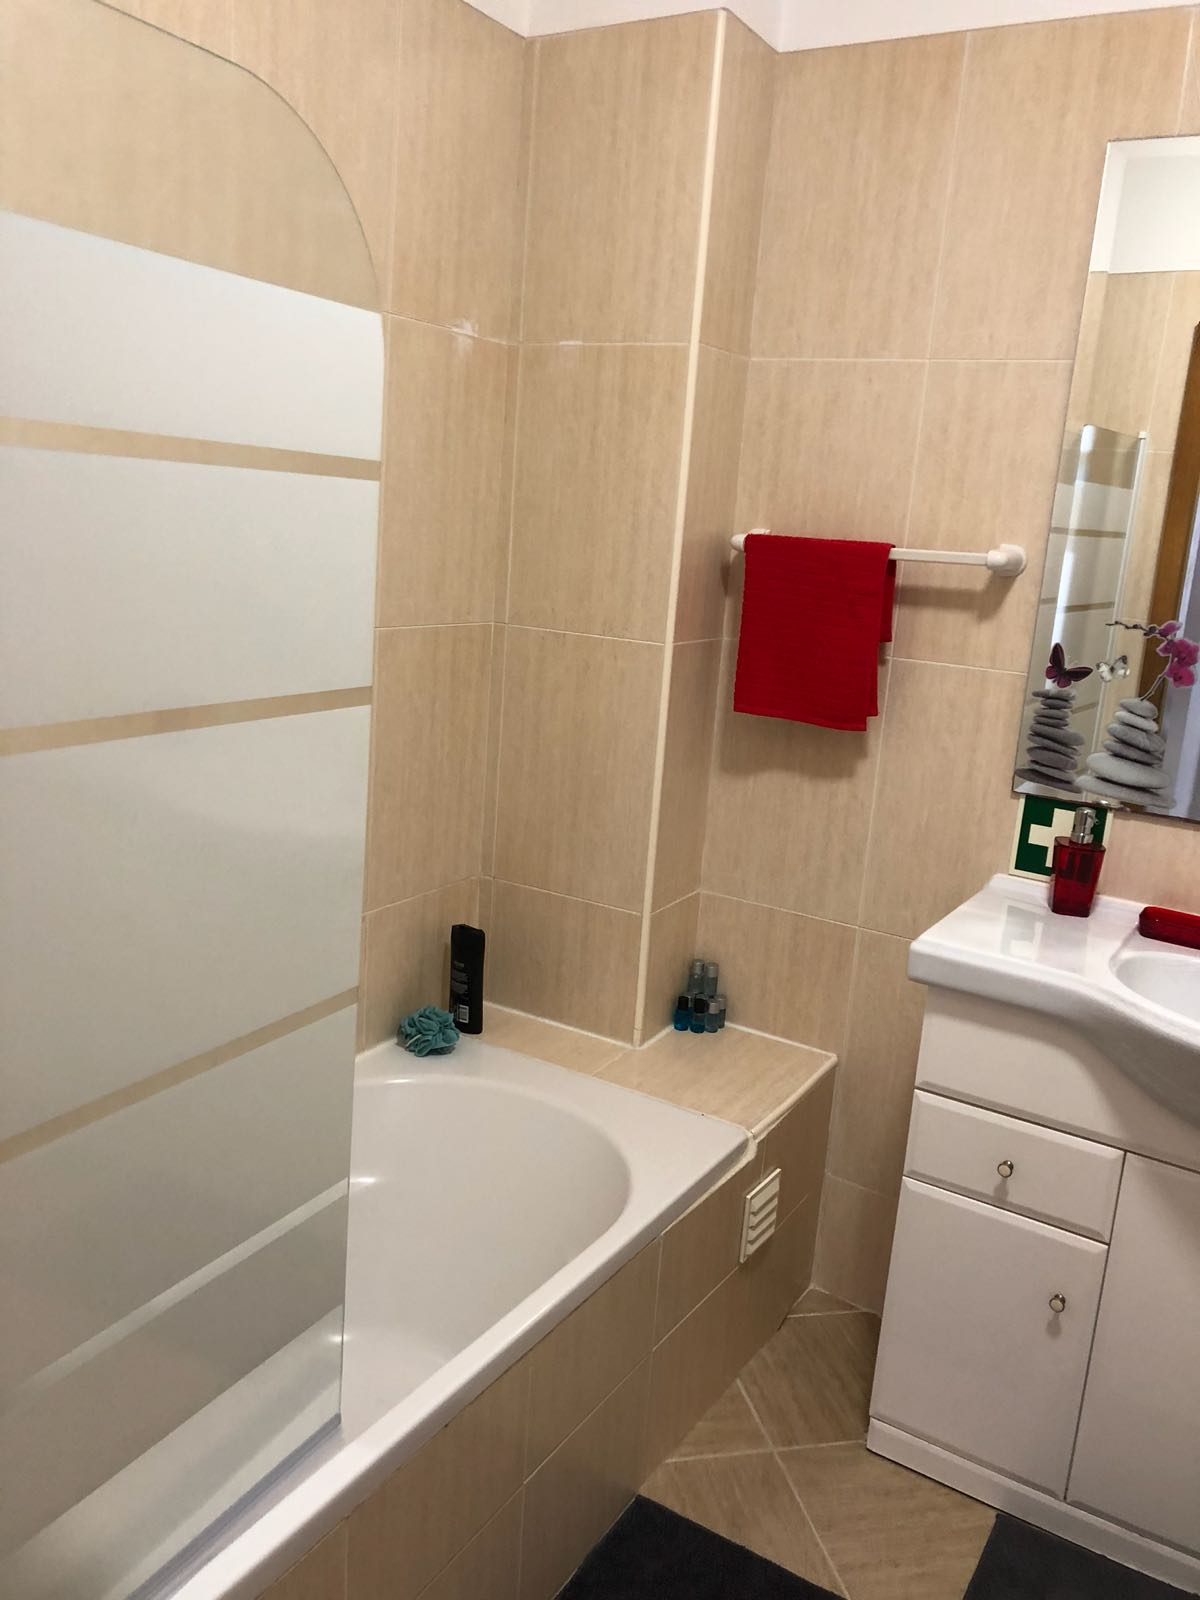 Holiday apartments and villas for rent, Apartamento T1 - Albufeira - Piscina e Garagem in Albufeira, Portugal Algarve, REF_IMG_6128_6131